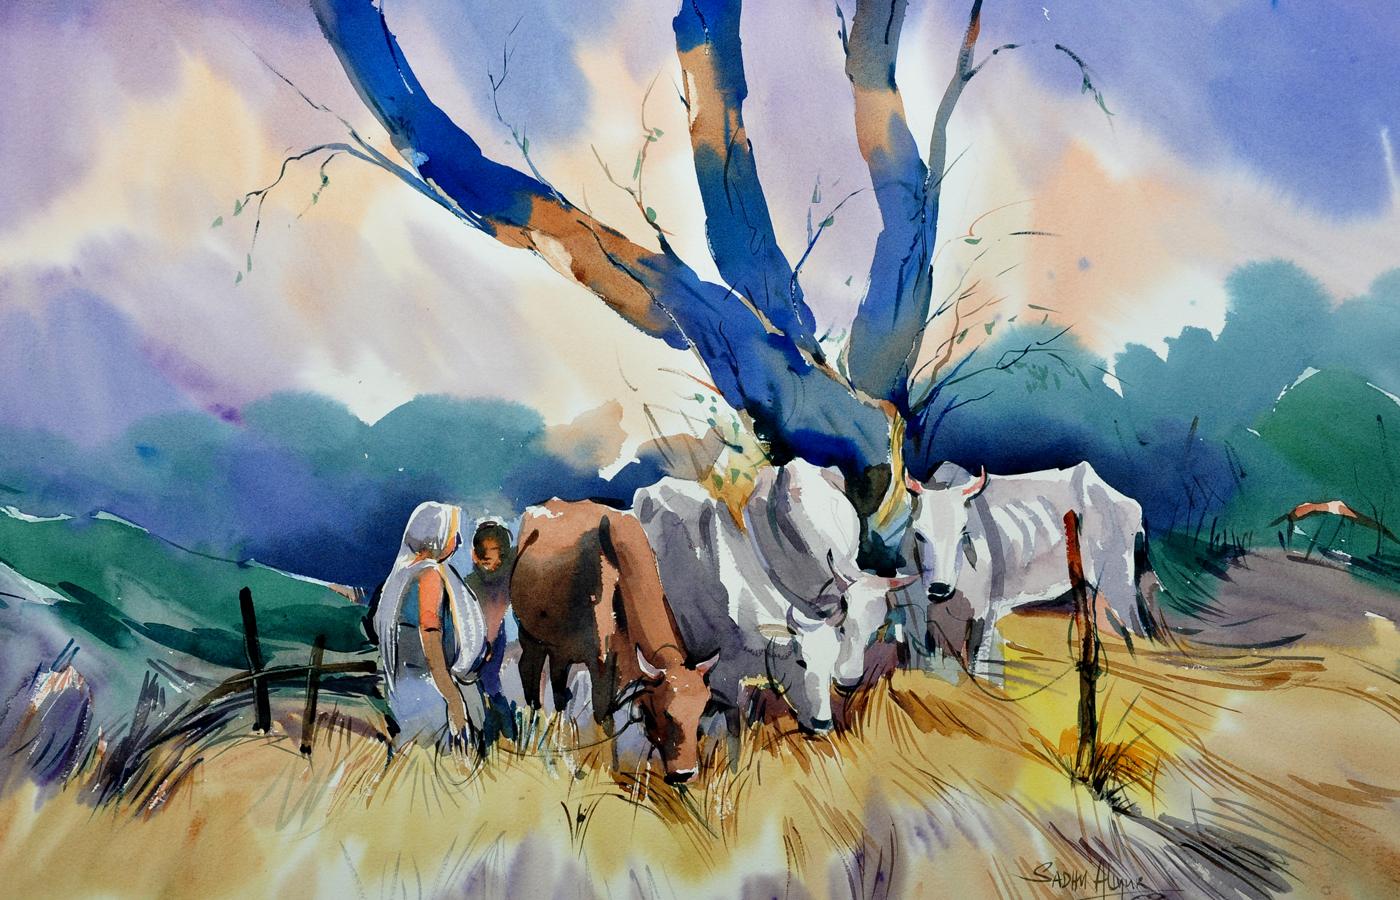 #WorldWatercolorGroup - Watercolor painting by Sadhu Aliyur - cows - #doodlewash